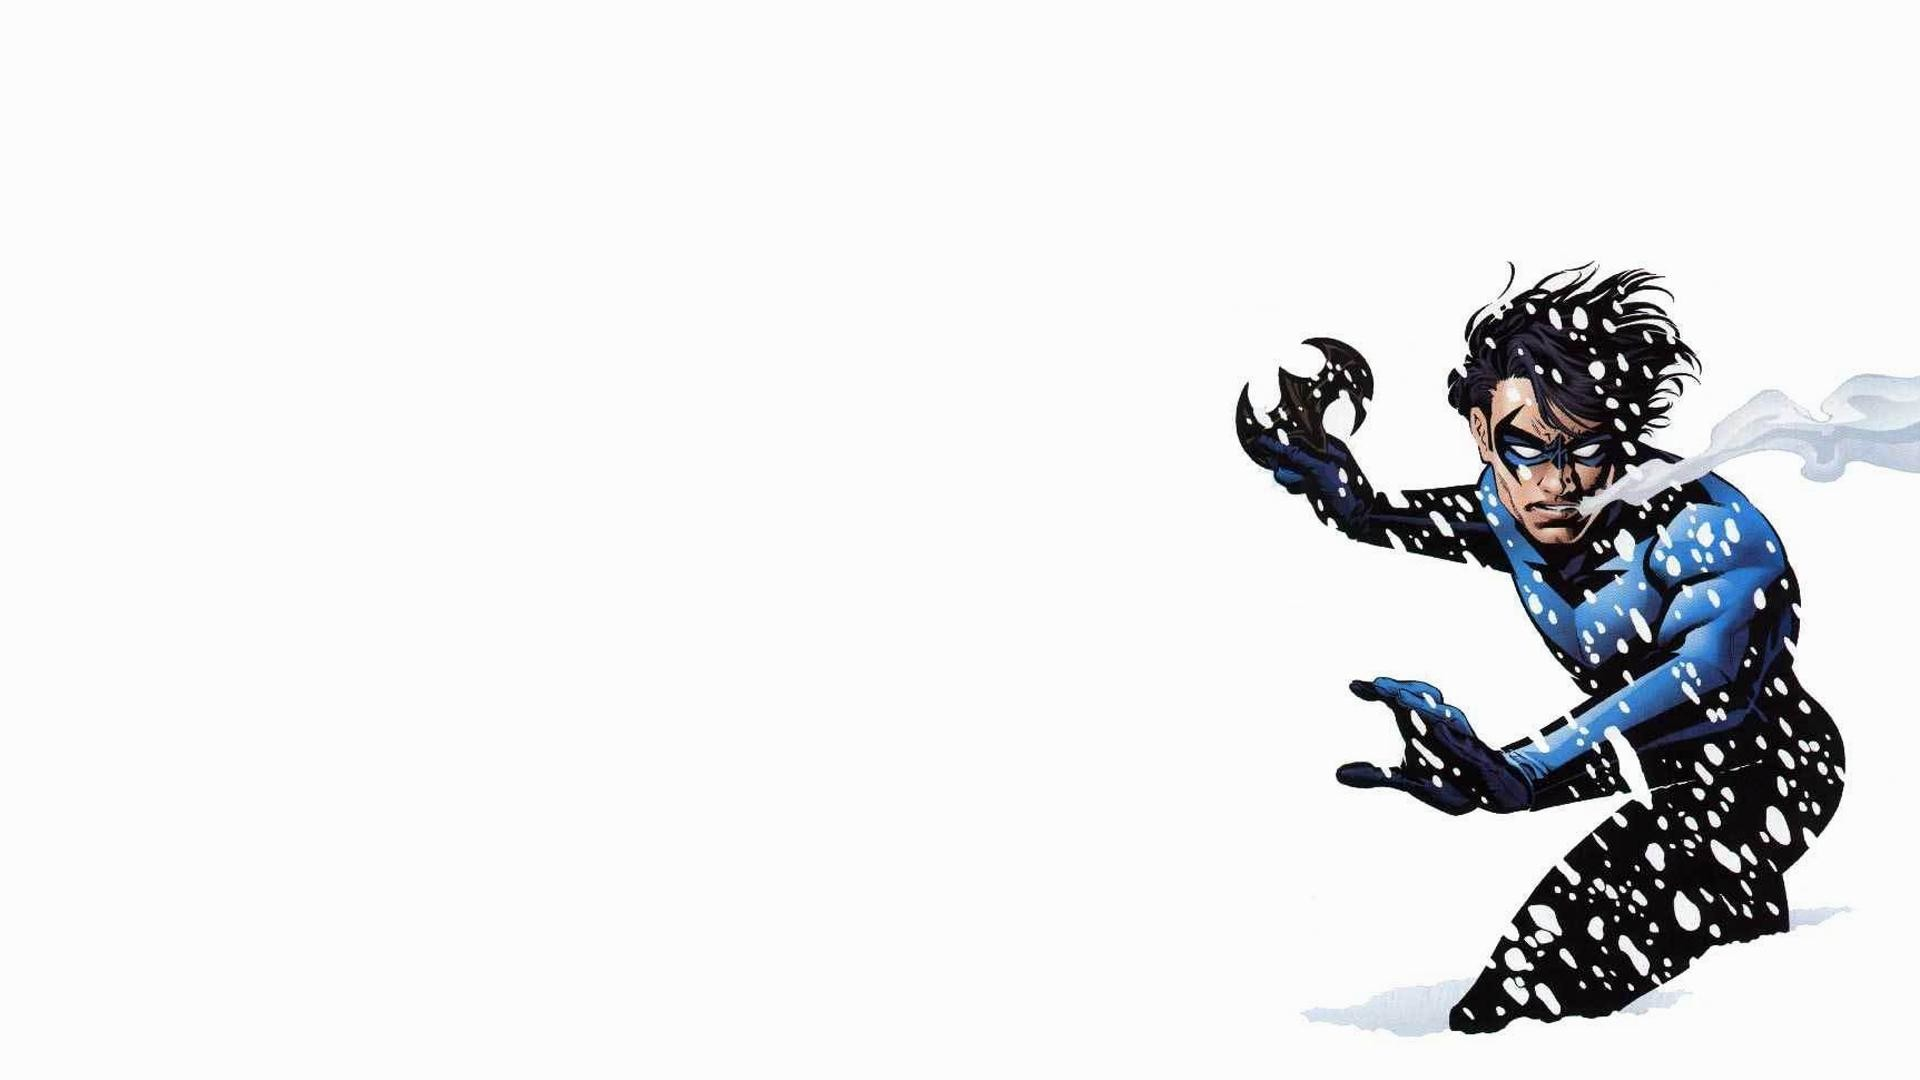 wallpaper.wiki-Photos-Nightwing-HD-PIC-WPE002306